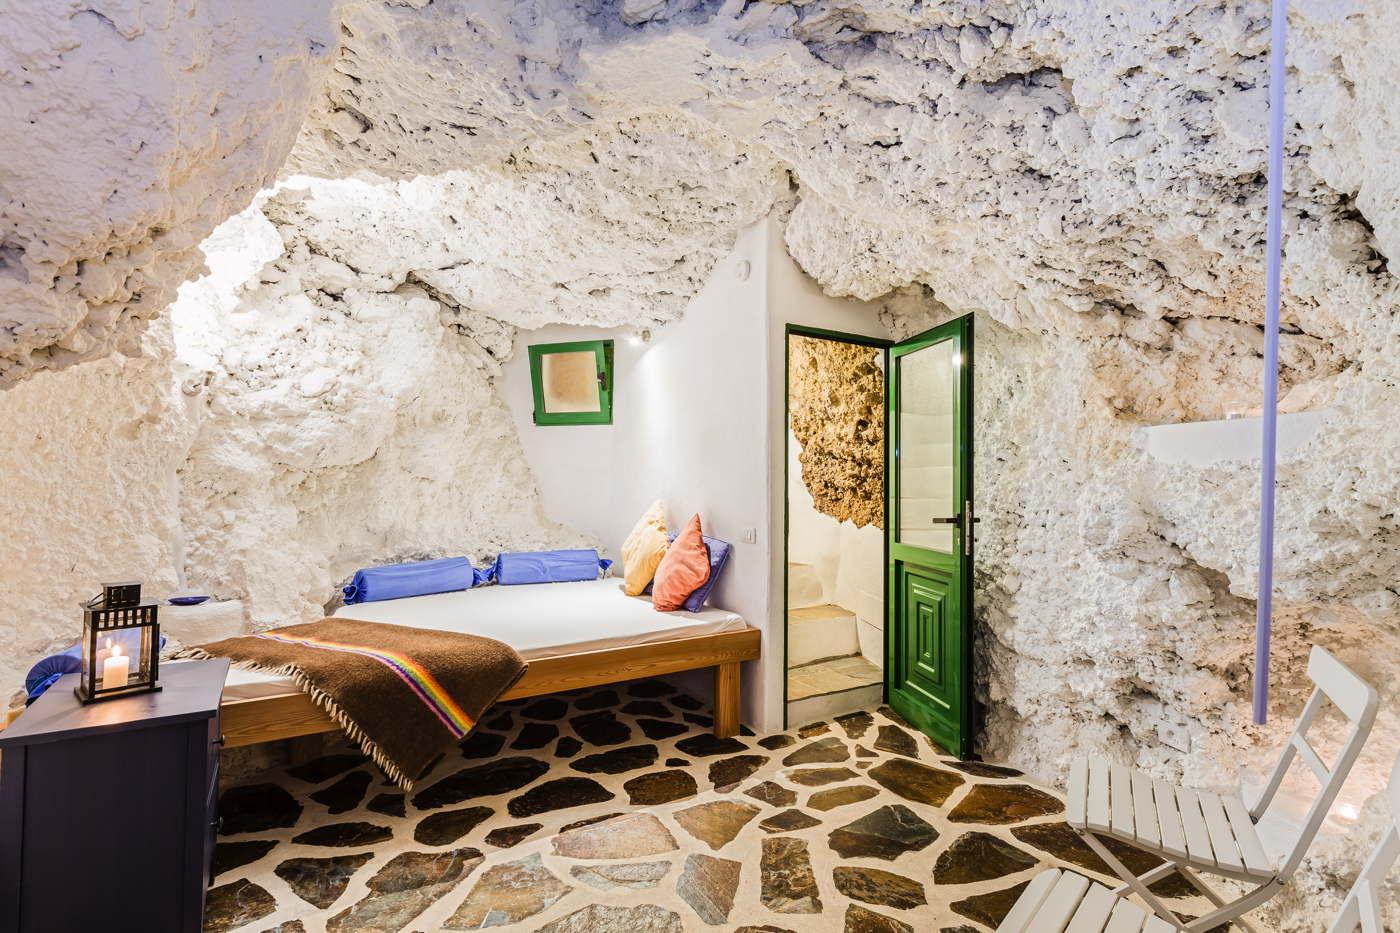 Ferienvilla mit beheiztem pool auf la palma domizile reisen for Villas corona